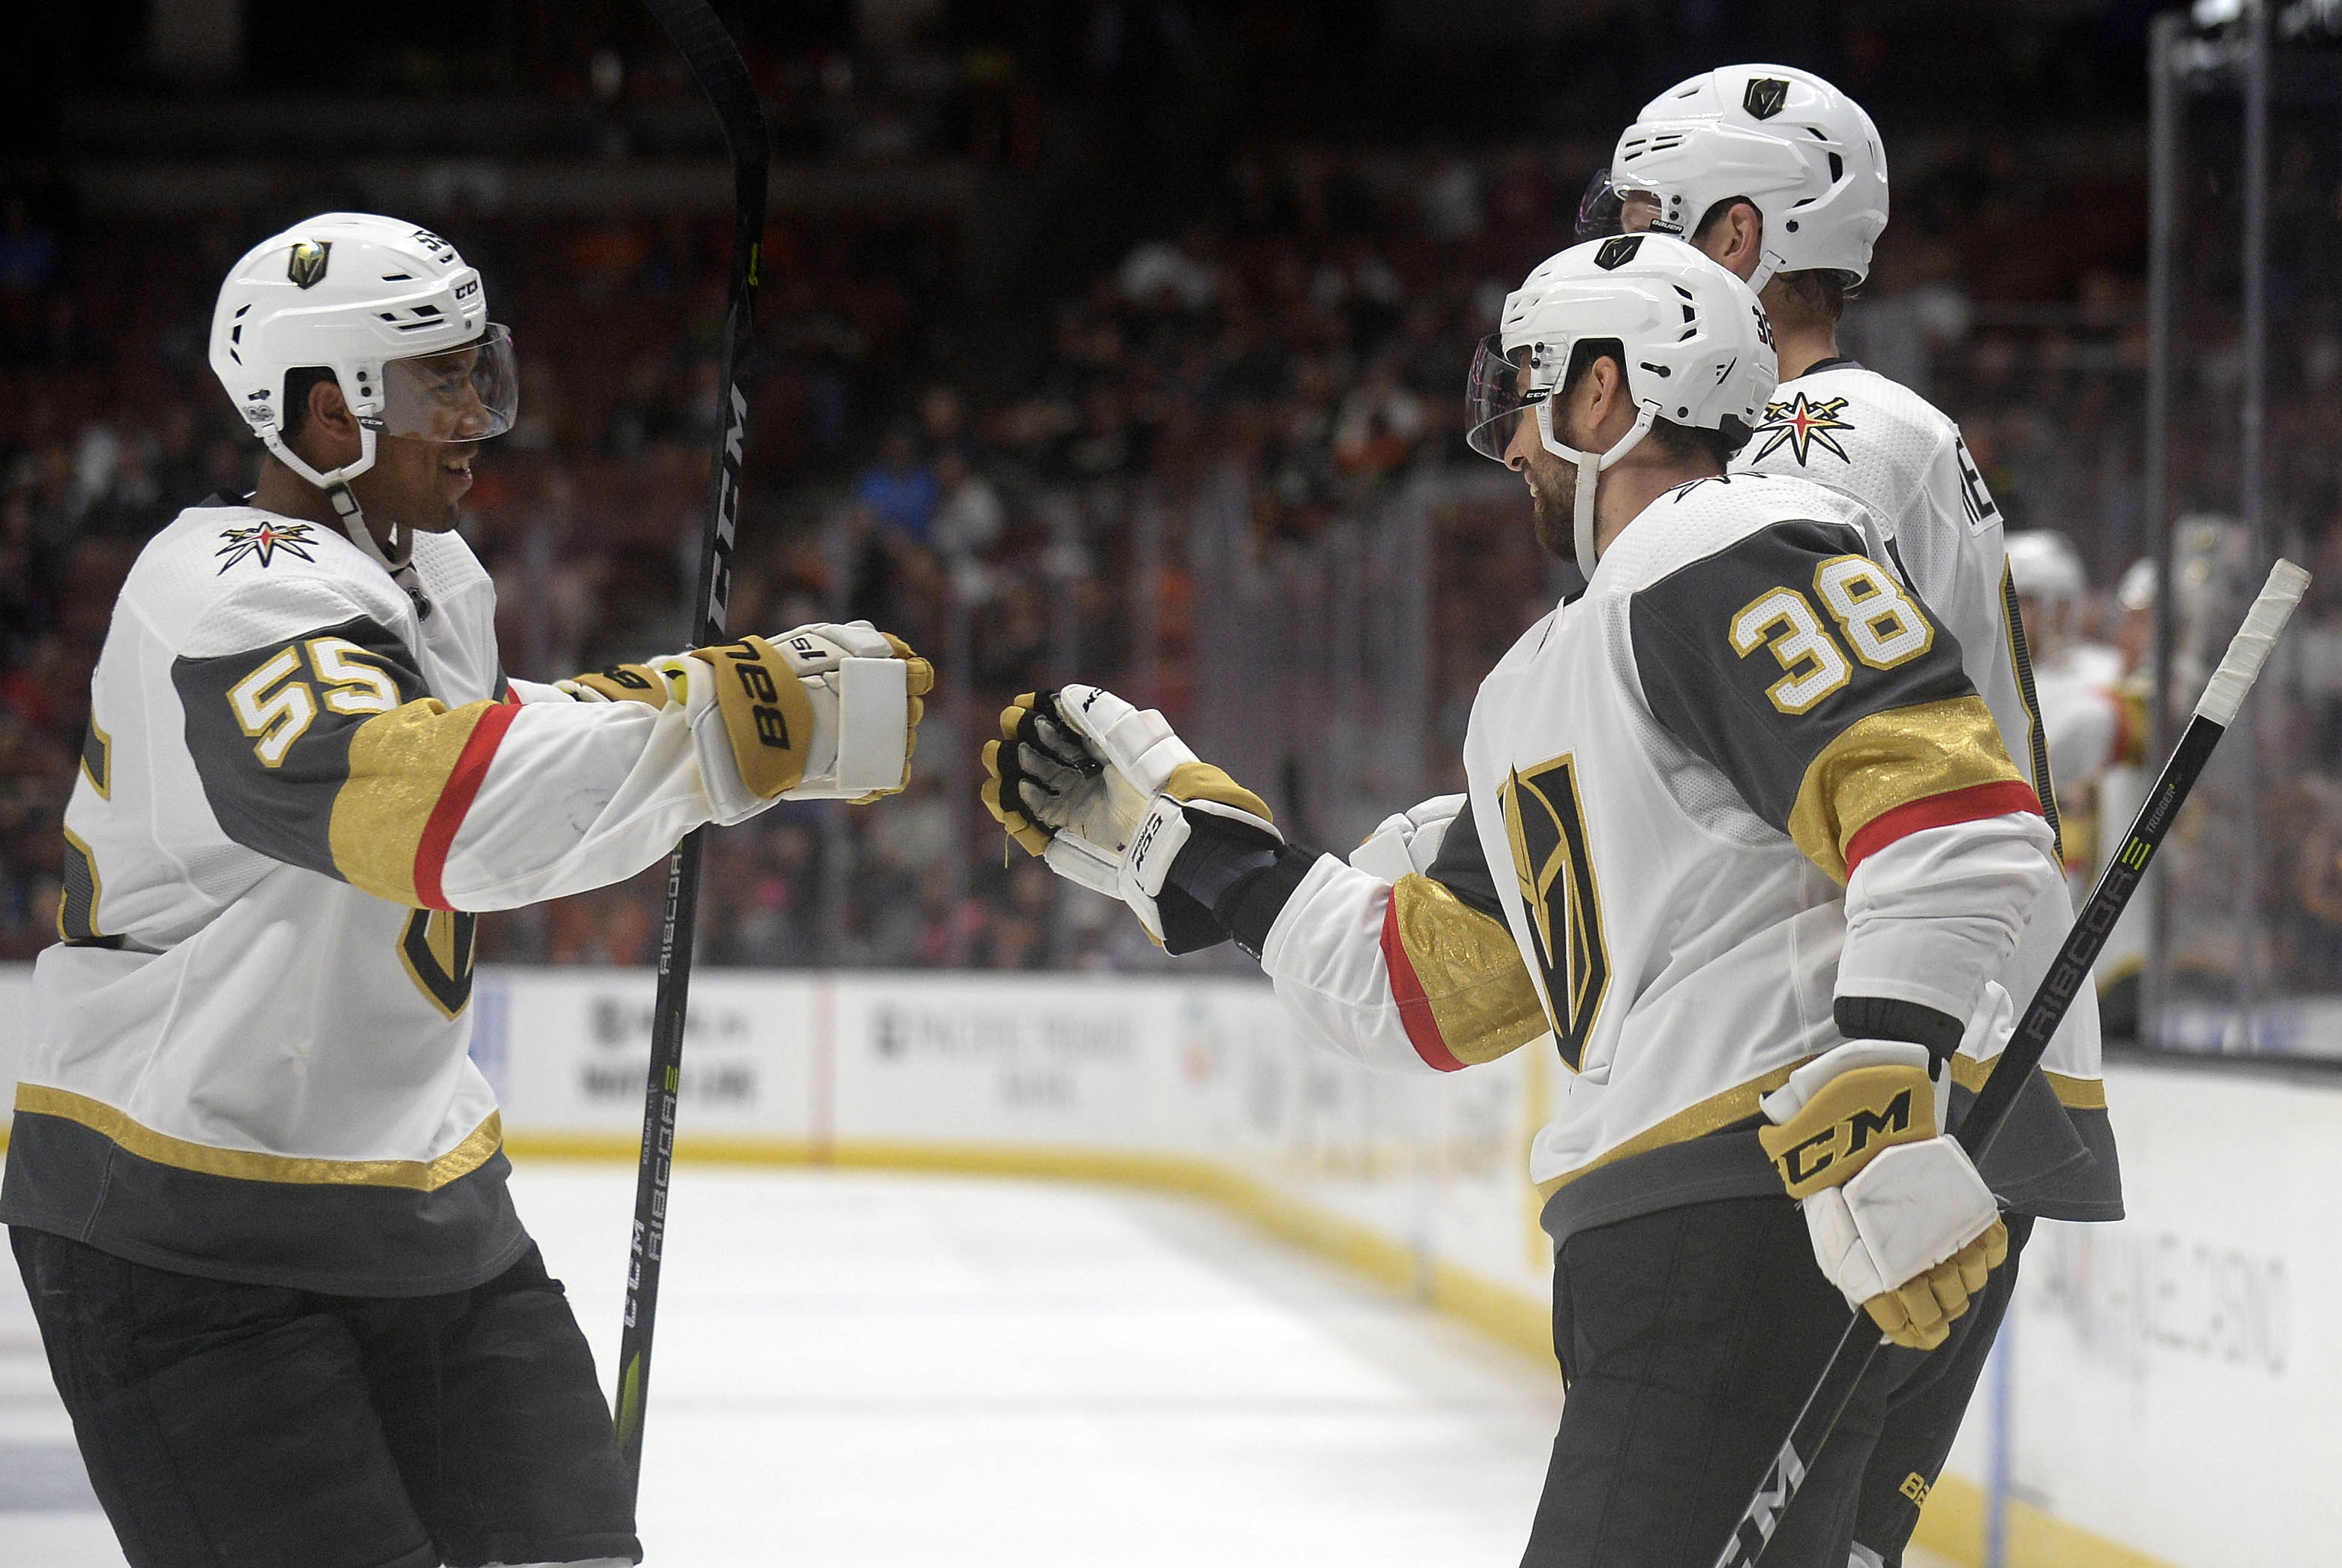 NHL: Preseason-Vegas Golden Knights at Anaheim Ducks